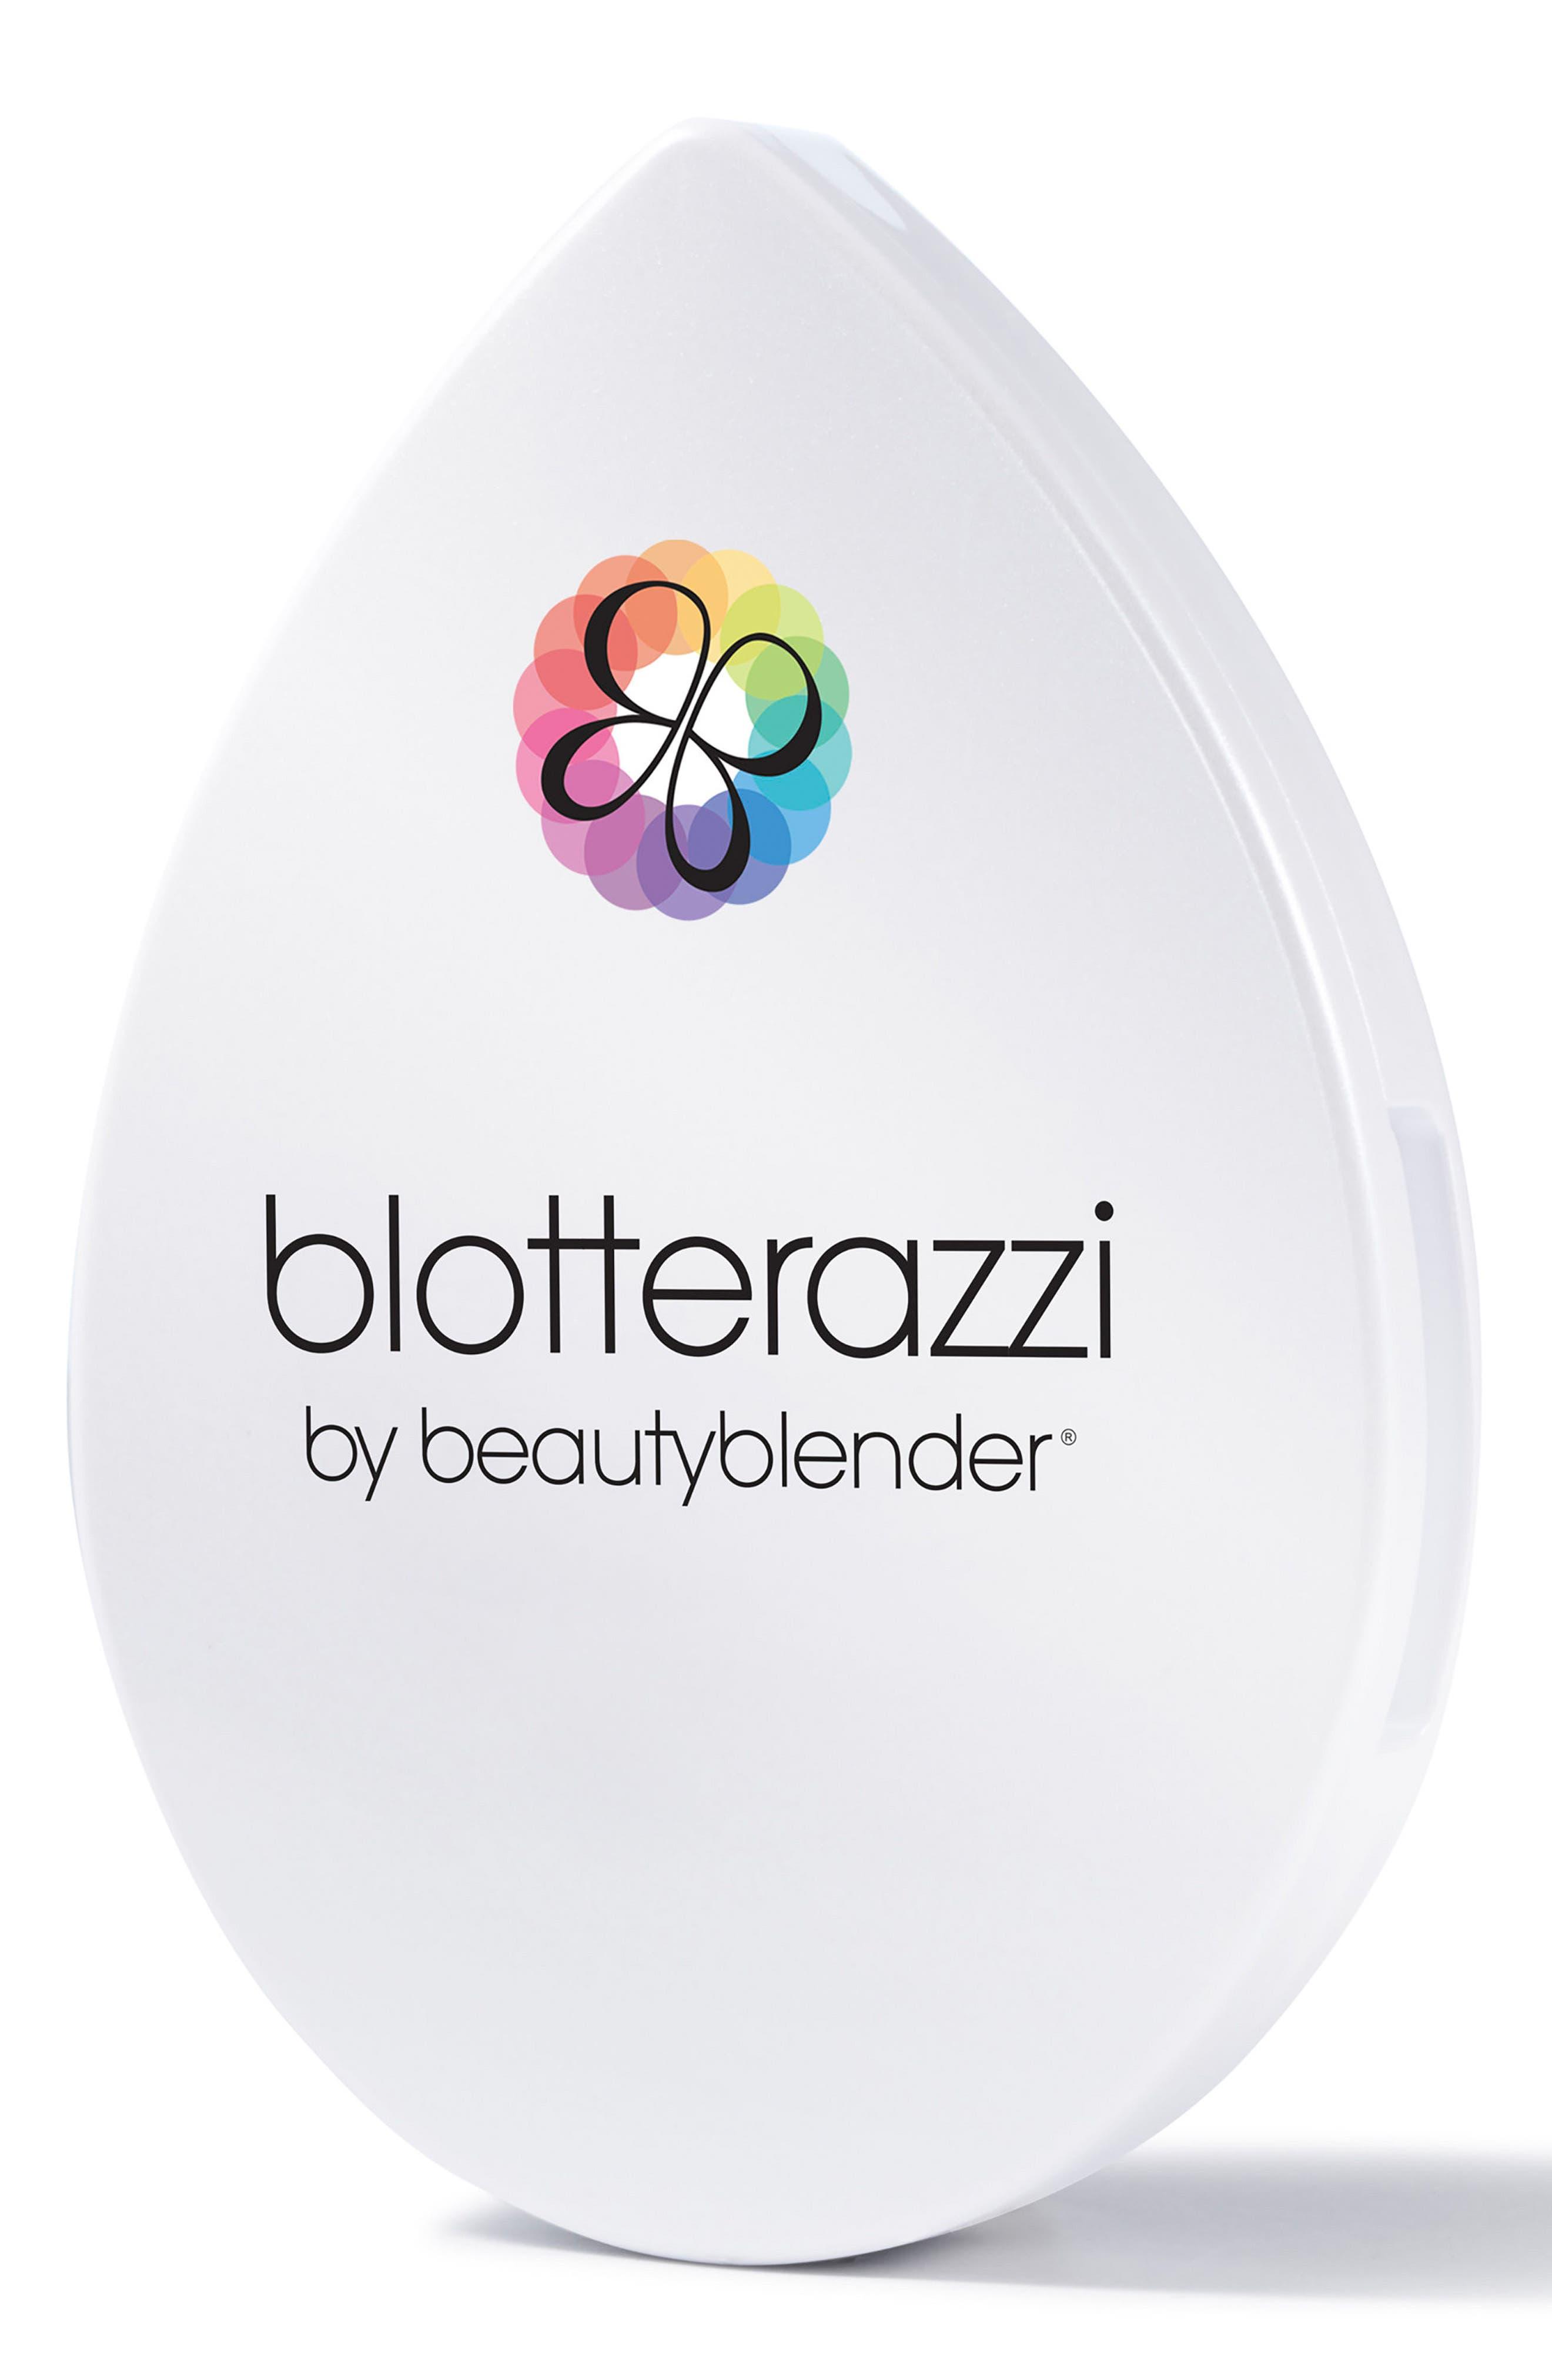 Beautyblender BEAUTYBLENDER BLOTTERAZZI BLOTTING SPONGES & COMPACT